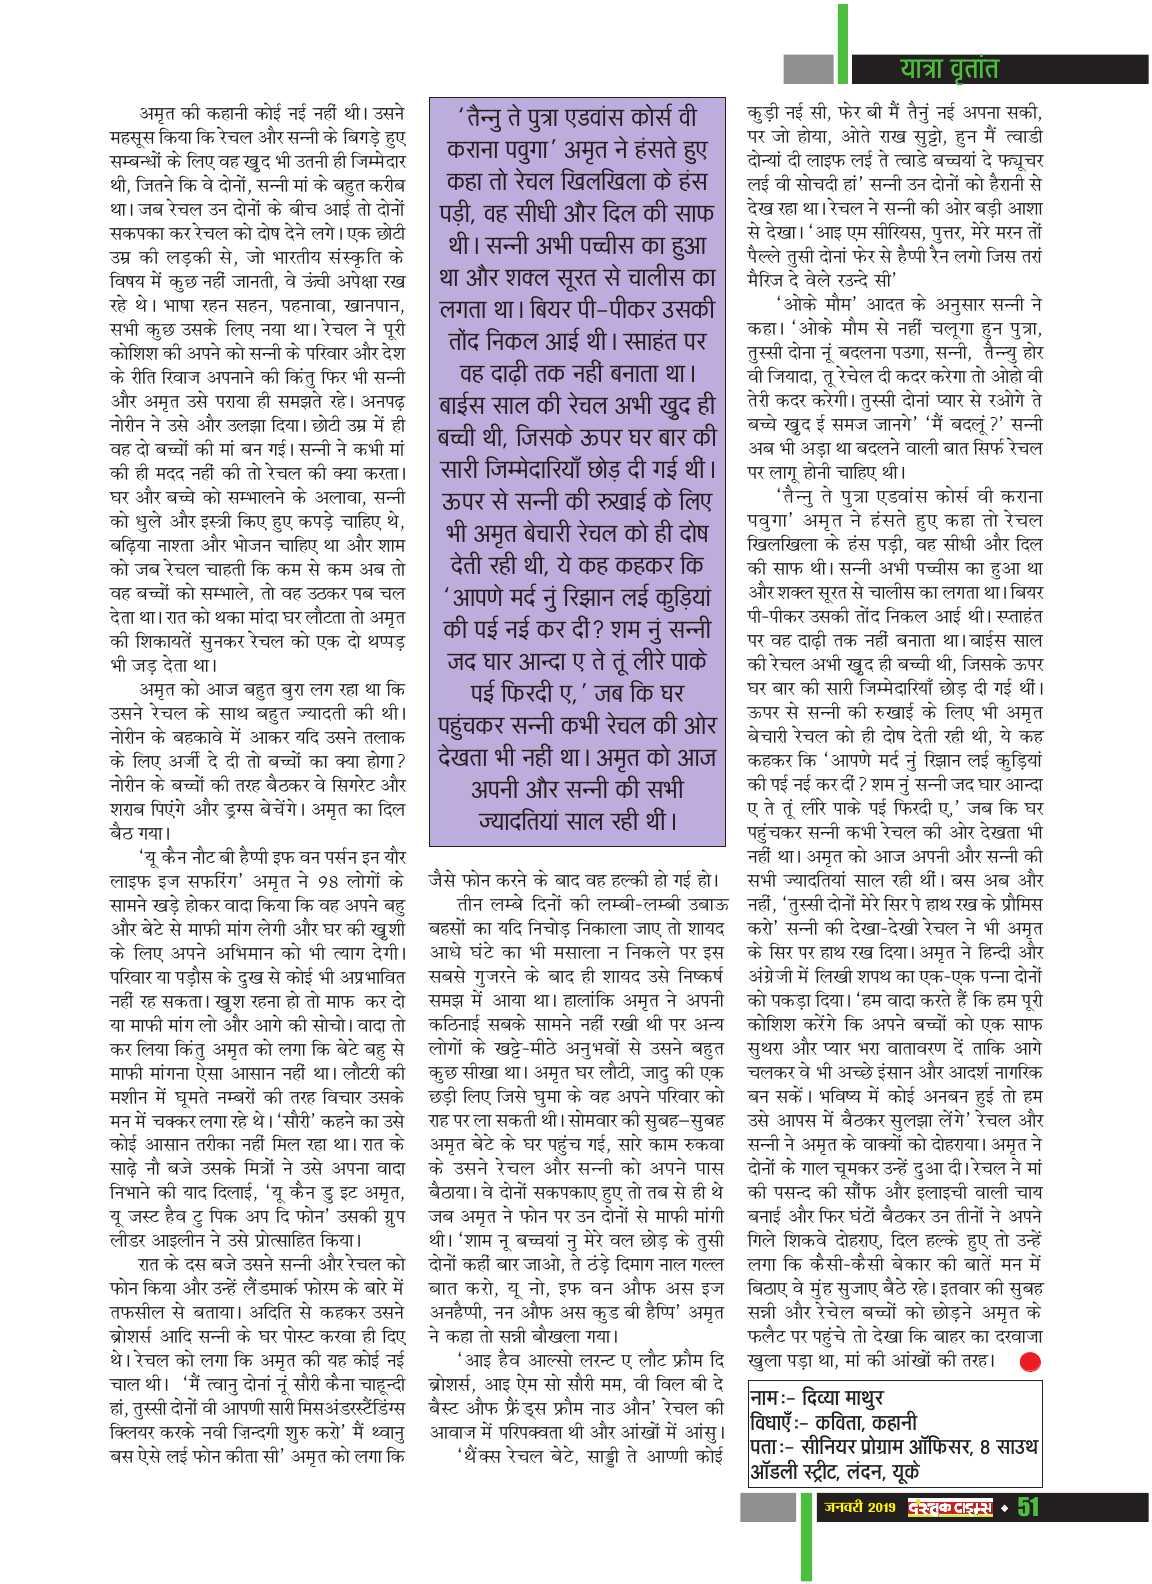 Dastak Times for E-Magazine 15 Jan 2019 new53